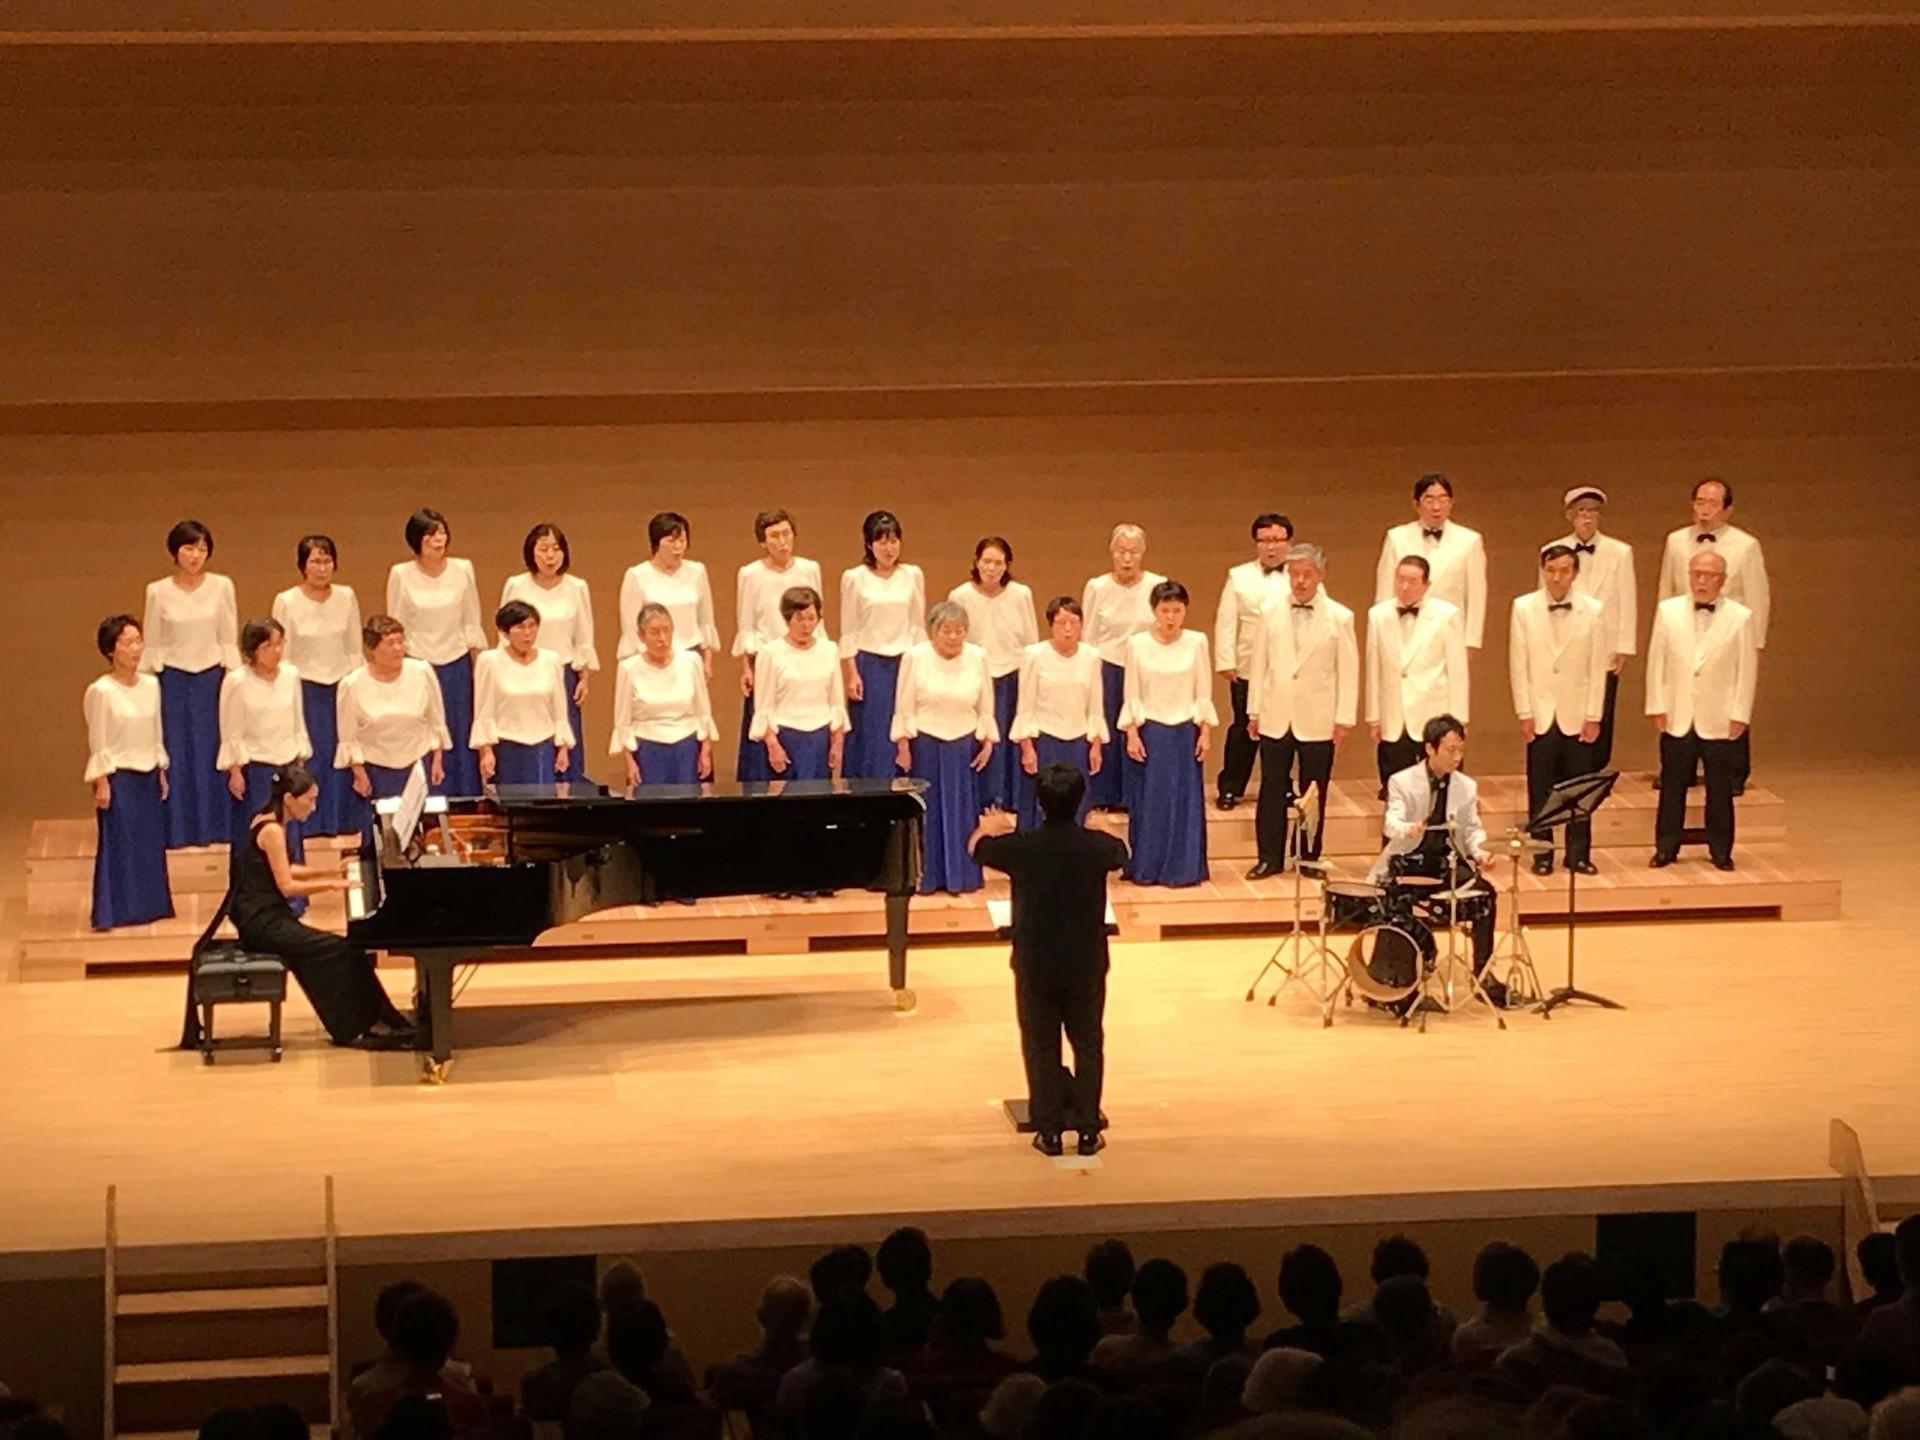 混声合唱団カンティアーモ第14回定期演奏会_JazzMass.JPG